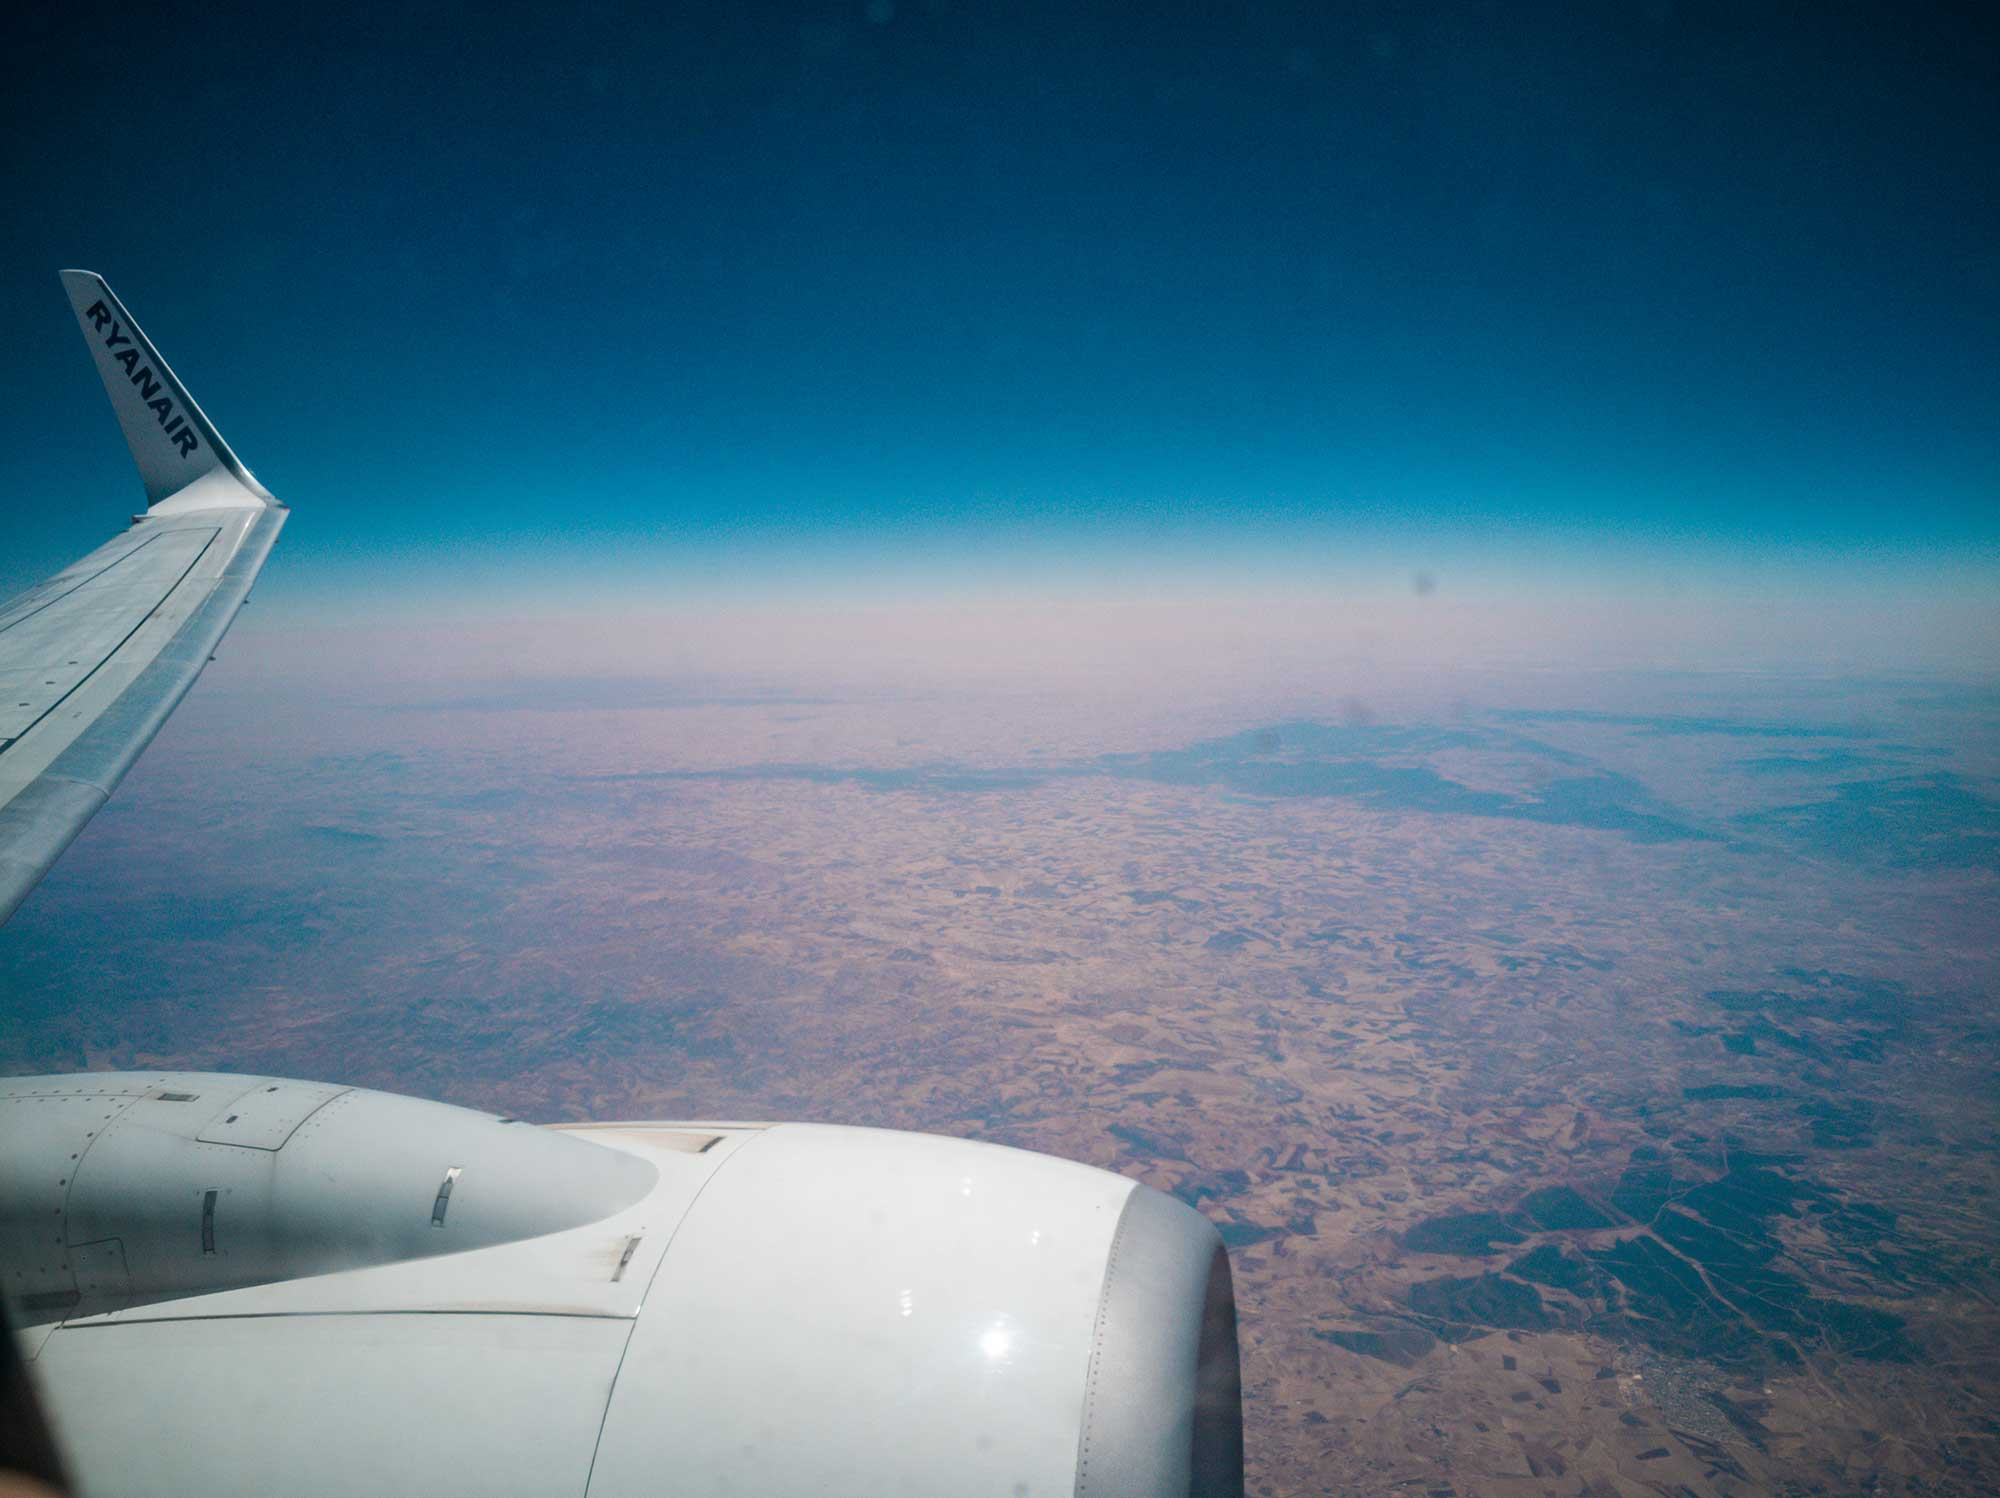 Africa vista finestrino